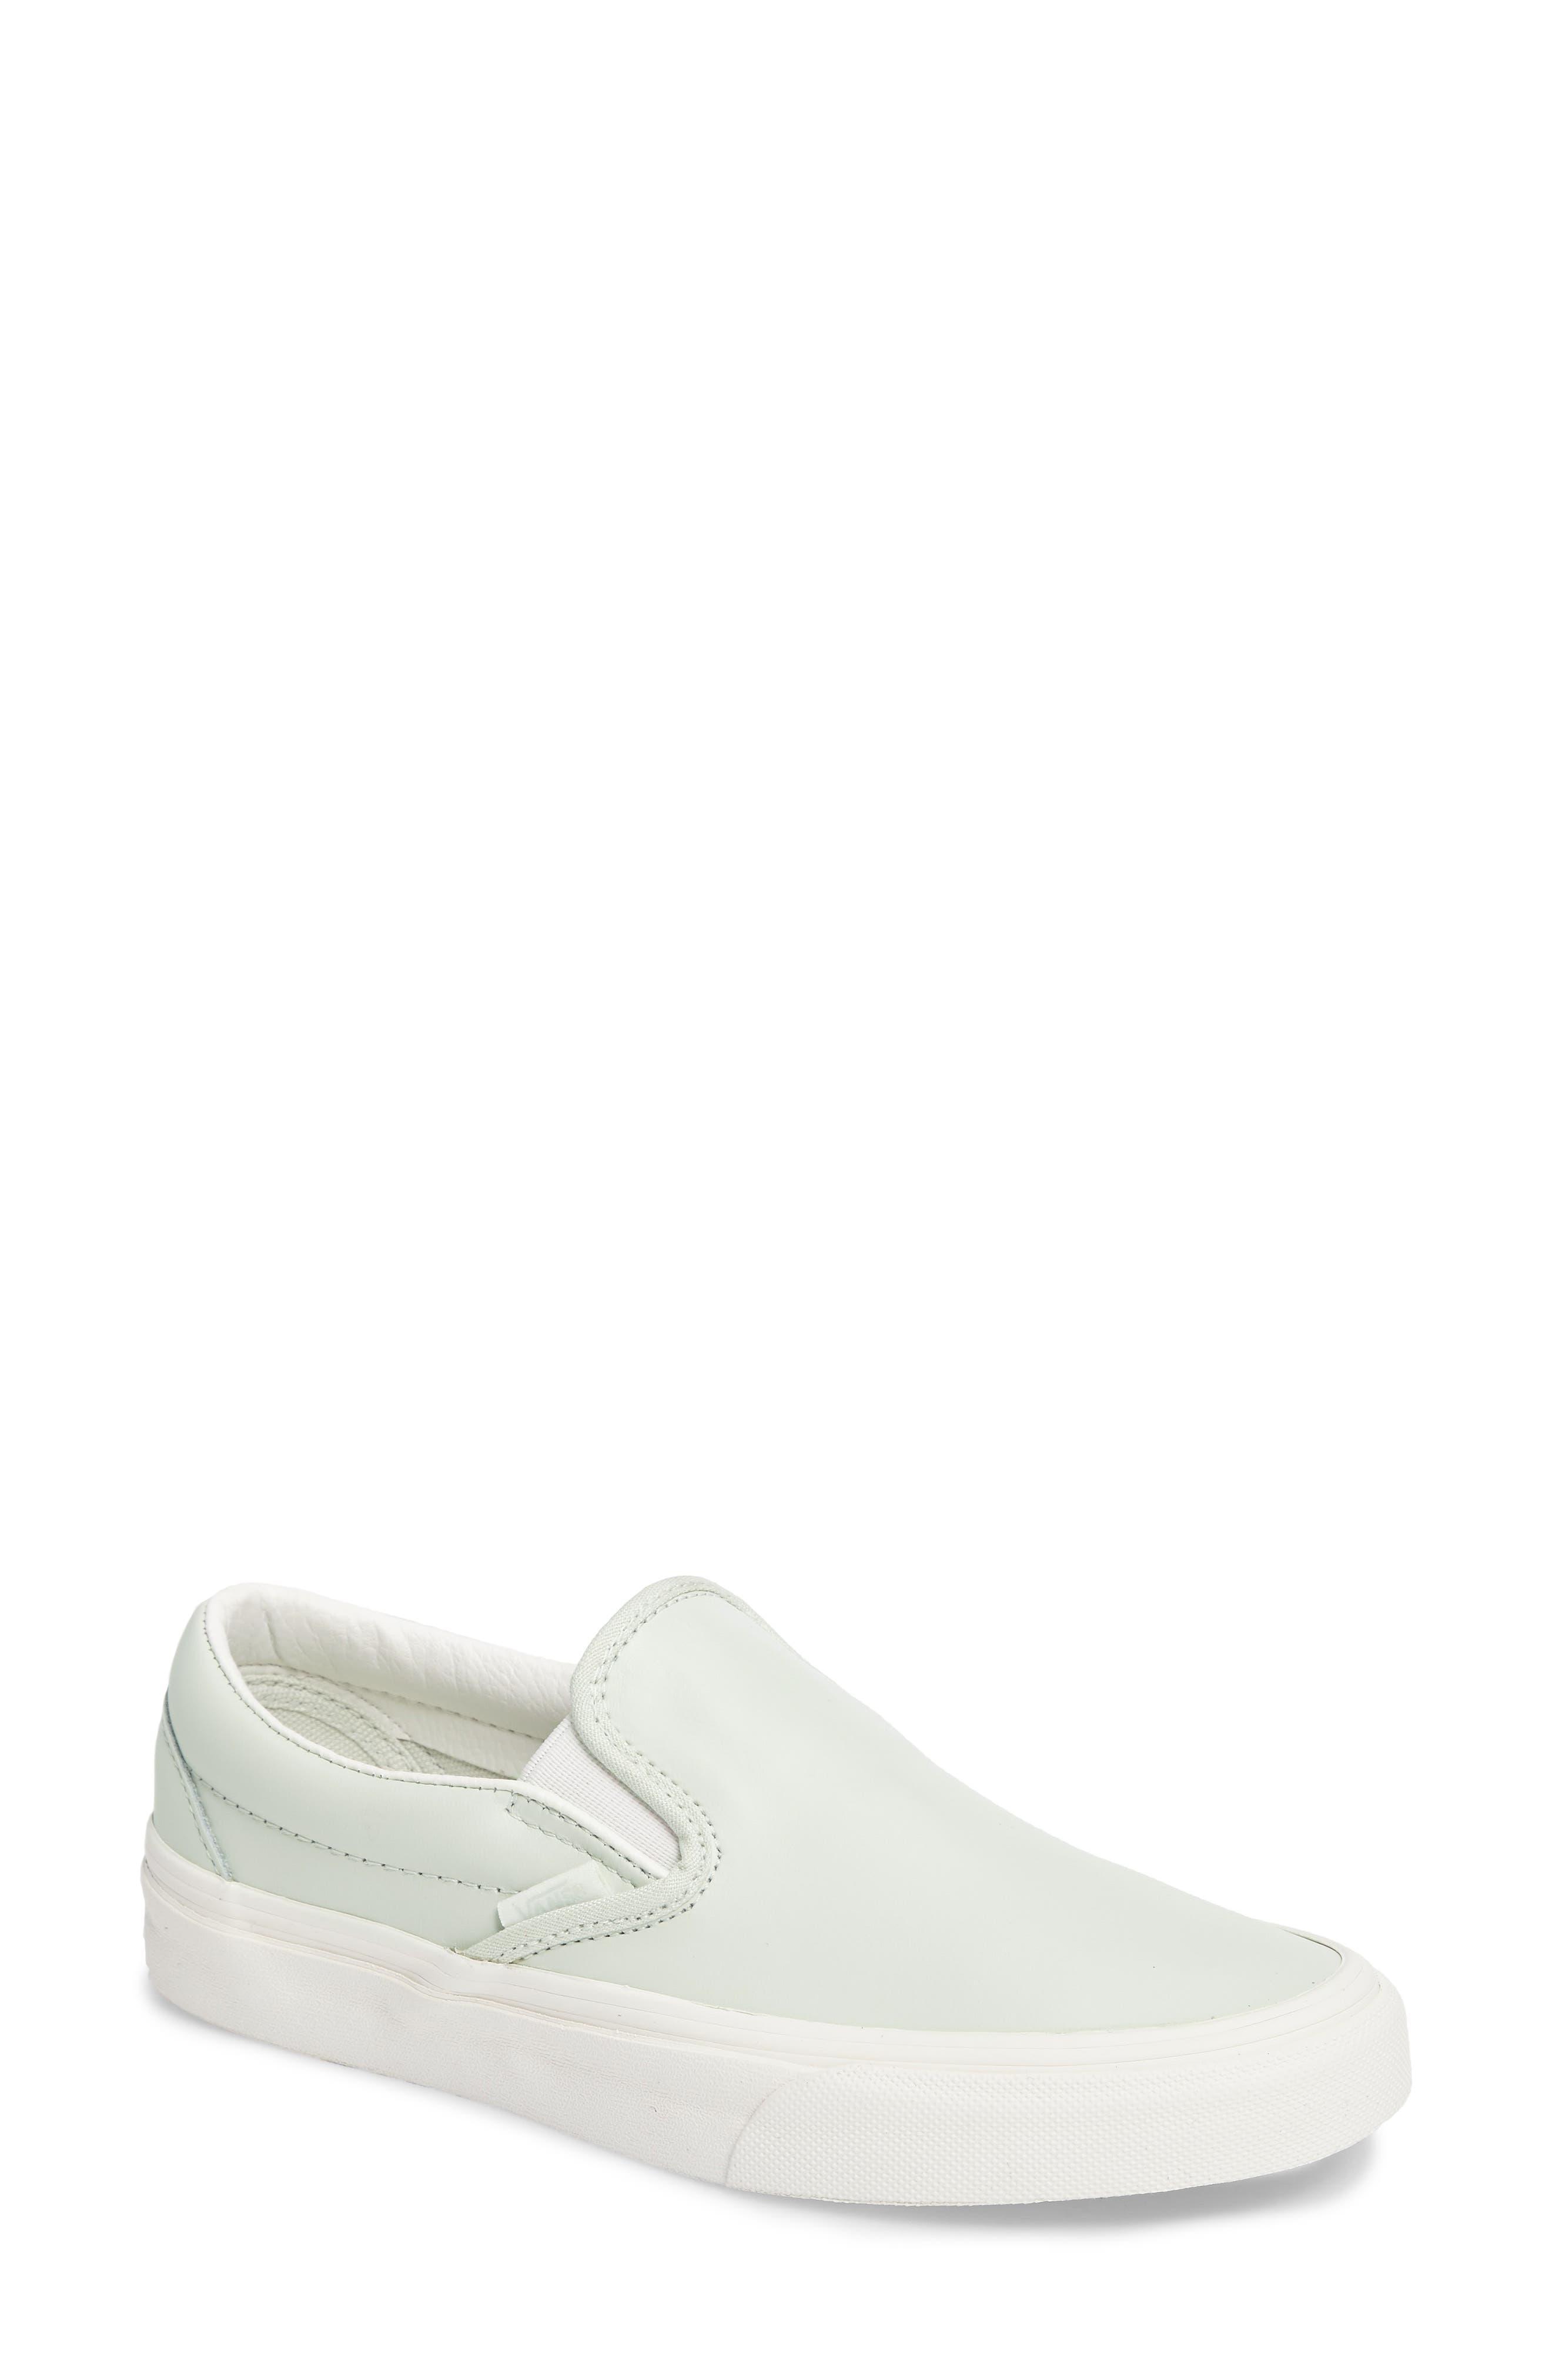 ,                             Classic Slip-On Sneaker,                             Main thumbnail 368, color,                             434